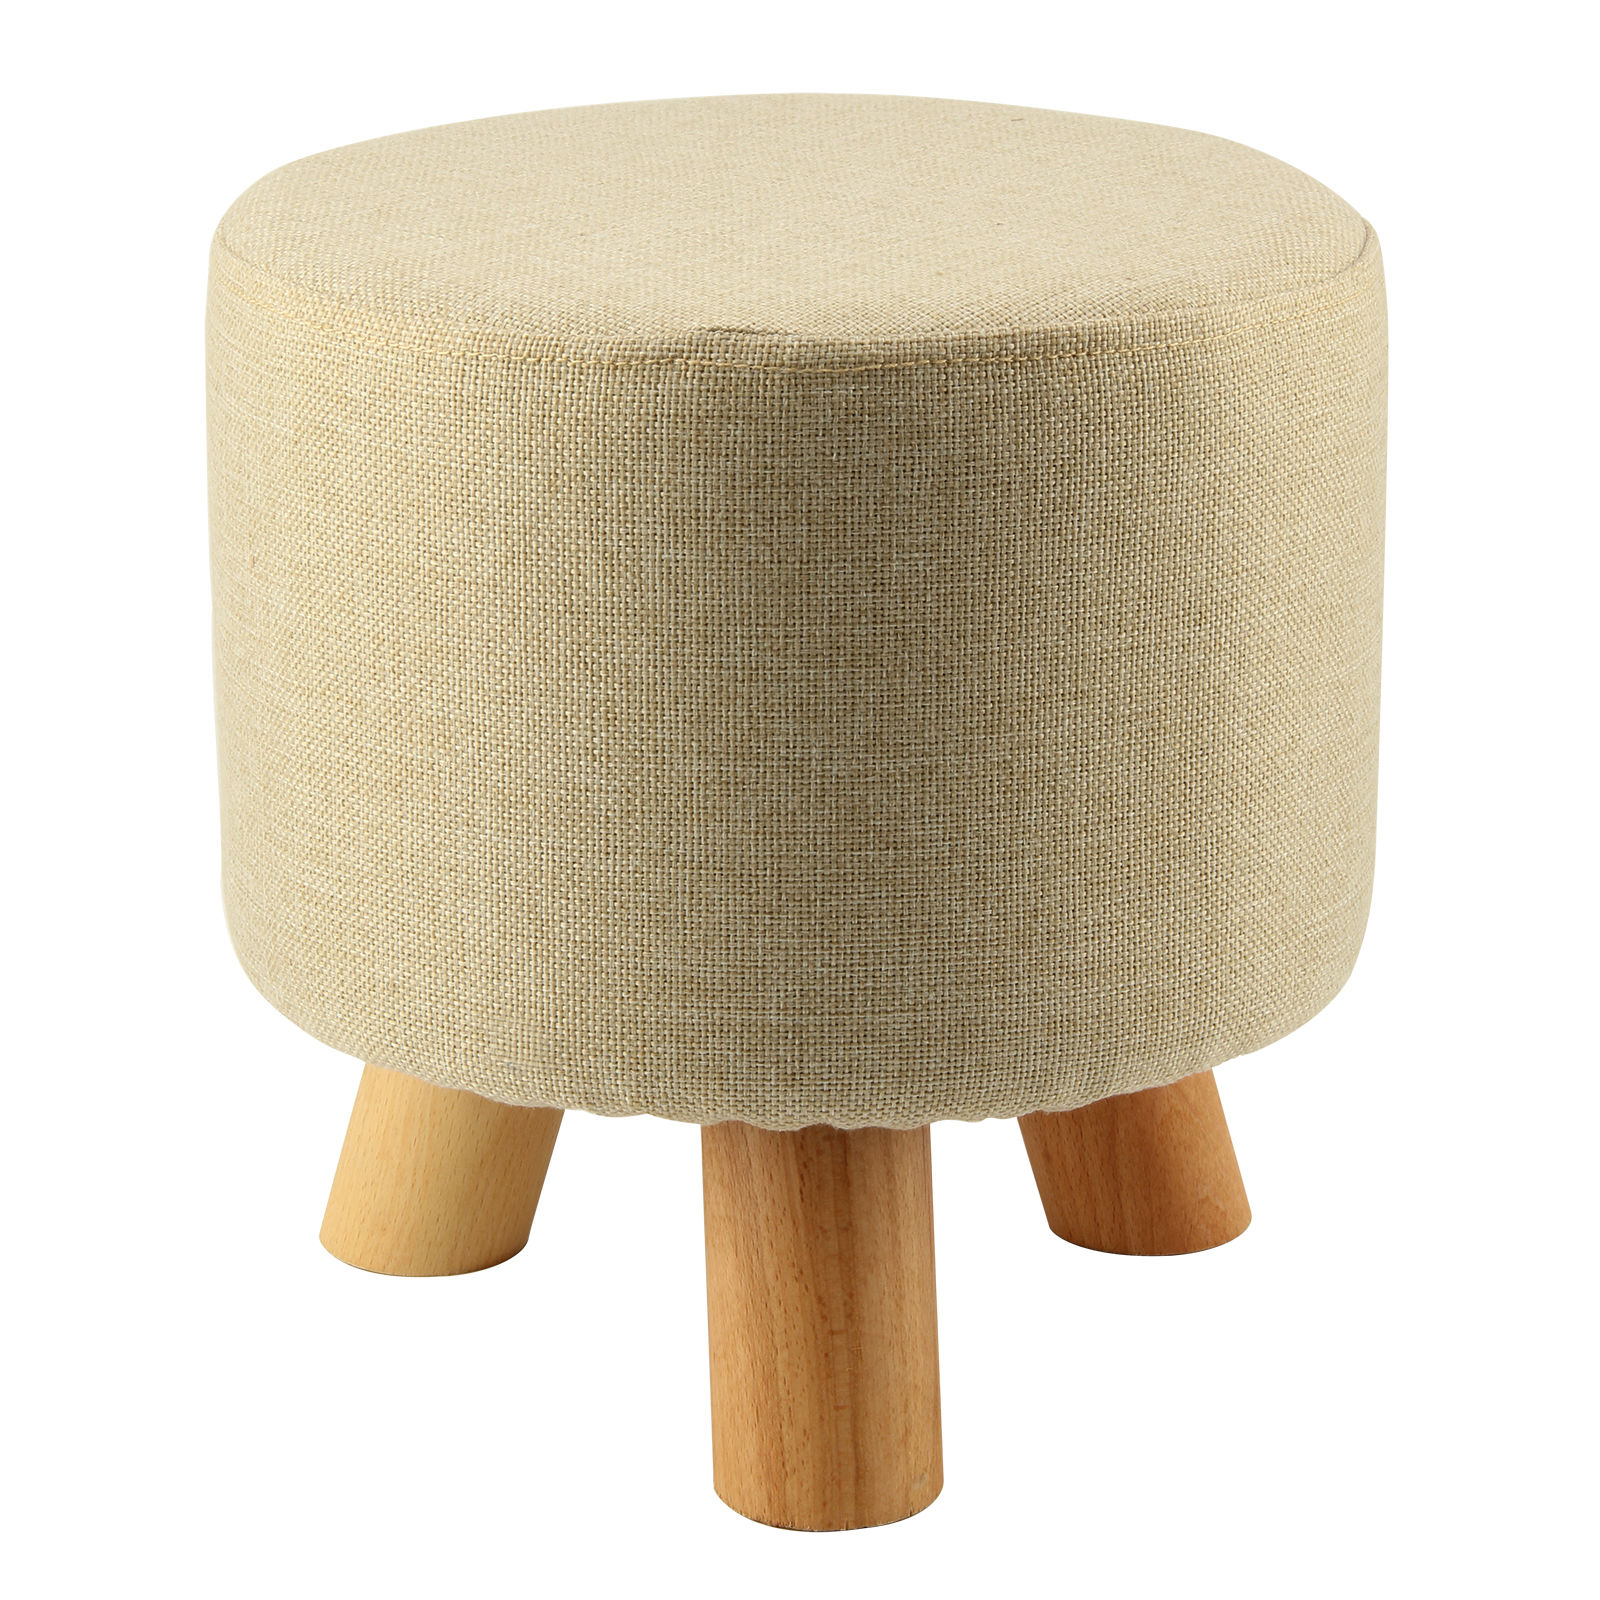 Modern Luxury Upholstered Footstool Round Pouffe Stool + Wooden Leg Pattern Round FabricGrey(3 Legs)  sc 1 st  AliExpress.com & Online Get Cheap Round Wood Stools -Aliexpress.com | Alibaba Group islam-shia.org